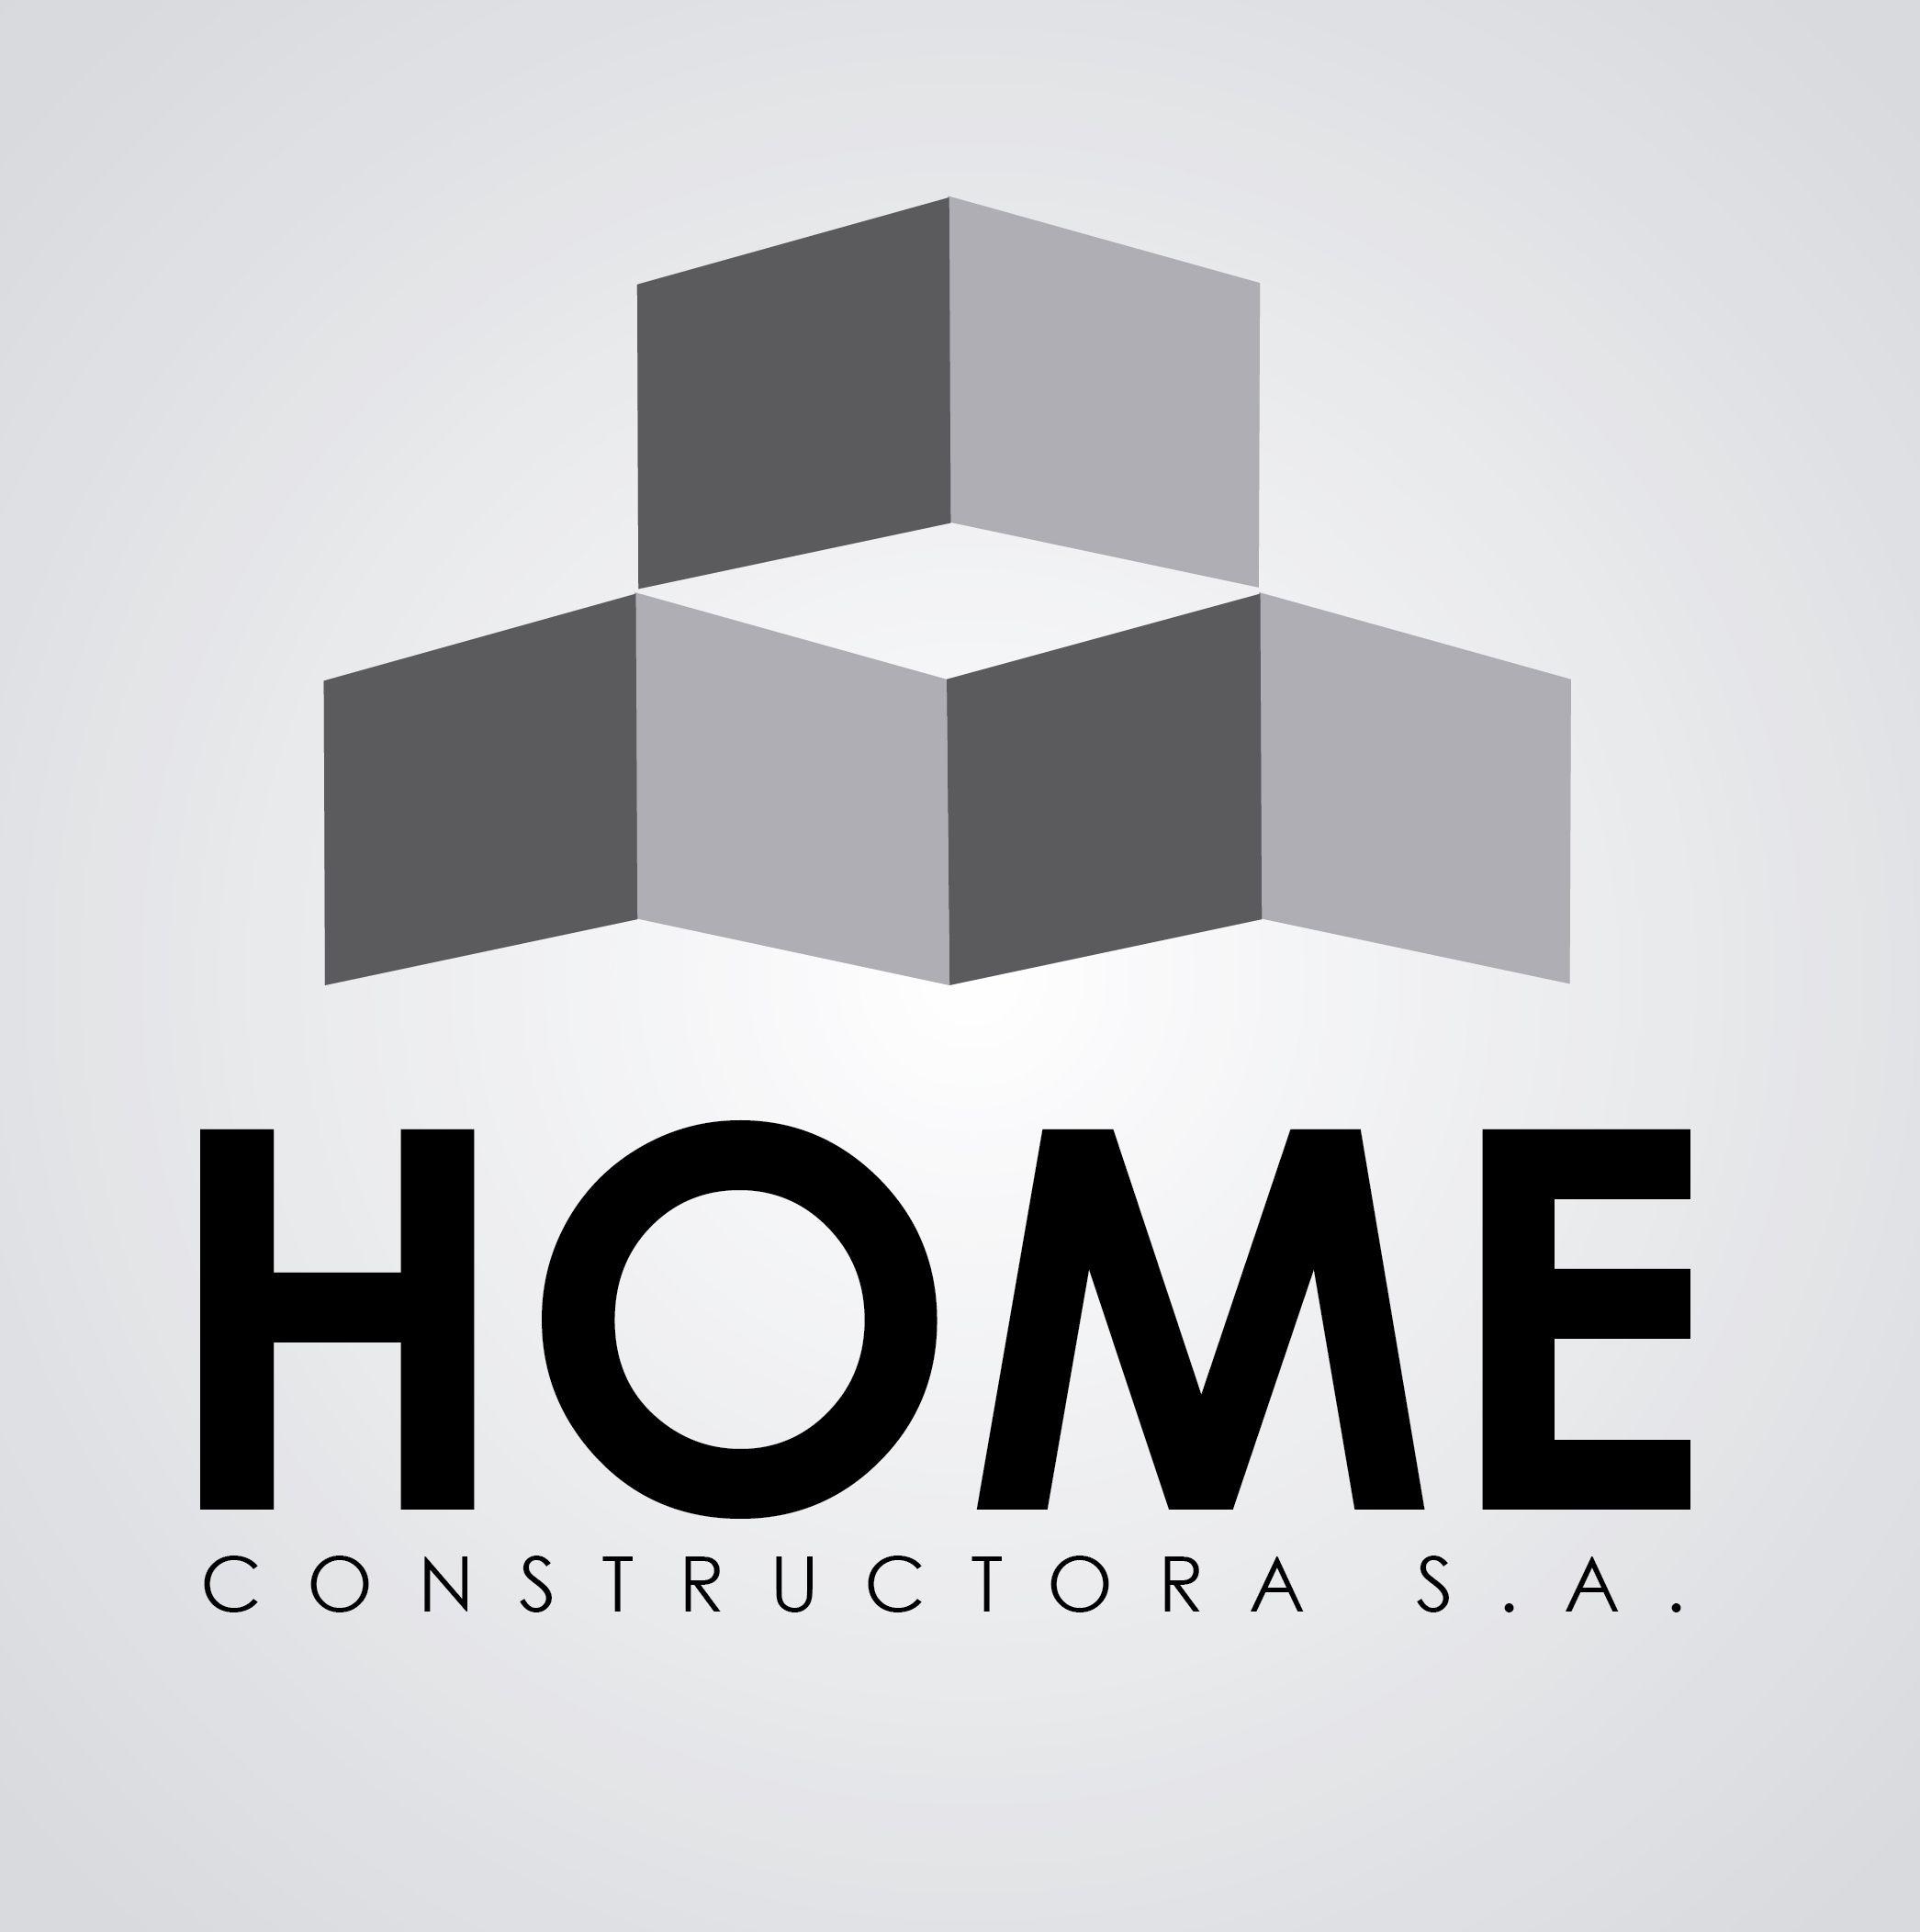 Marca para constructora logos pinterest marca for Constructora